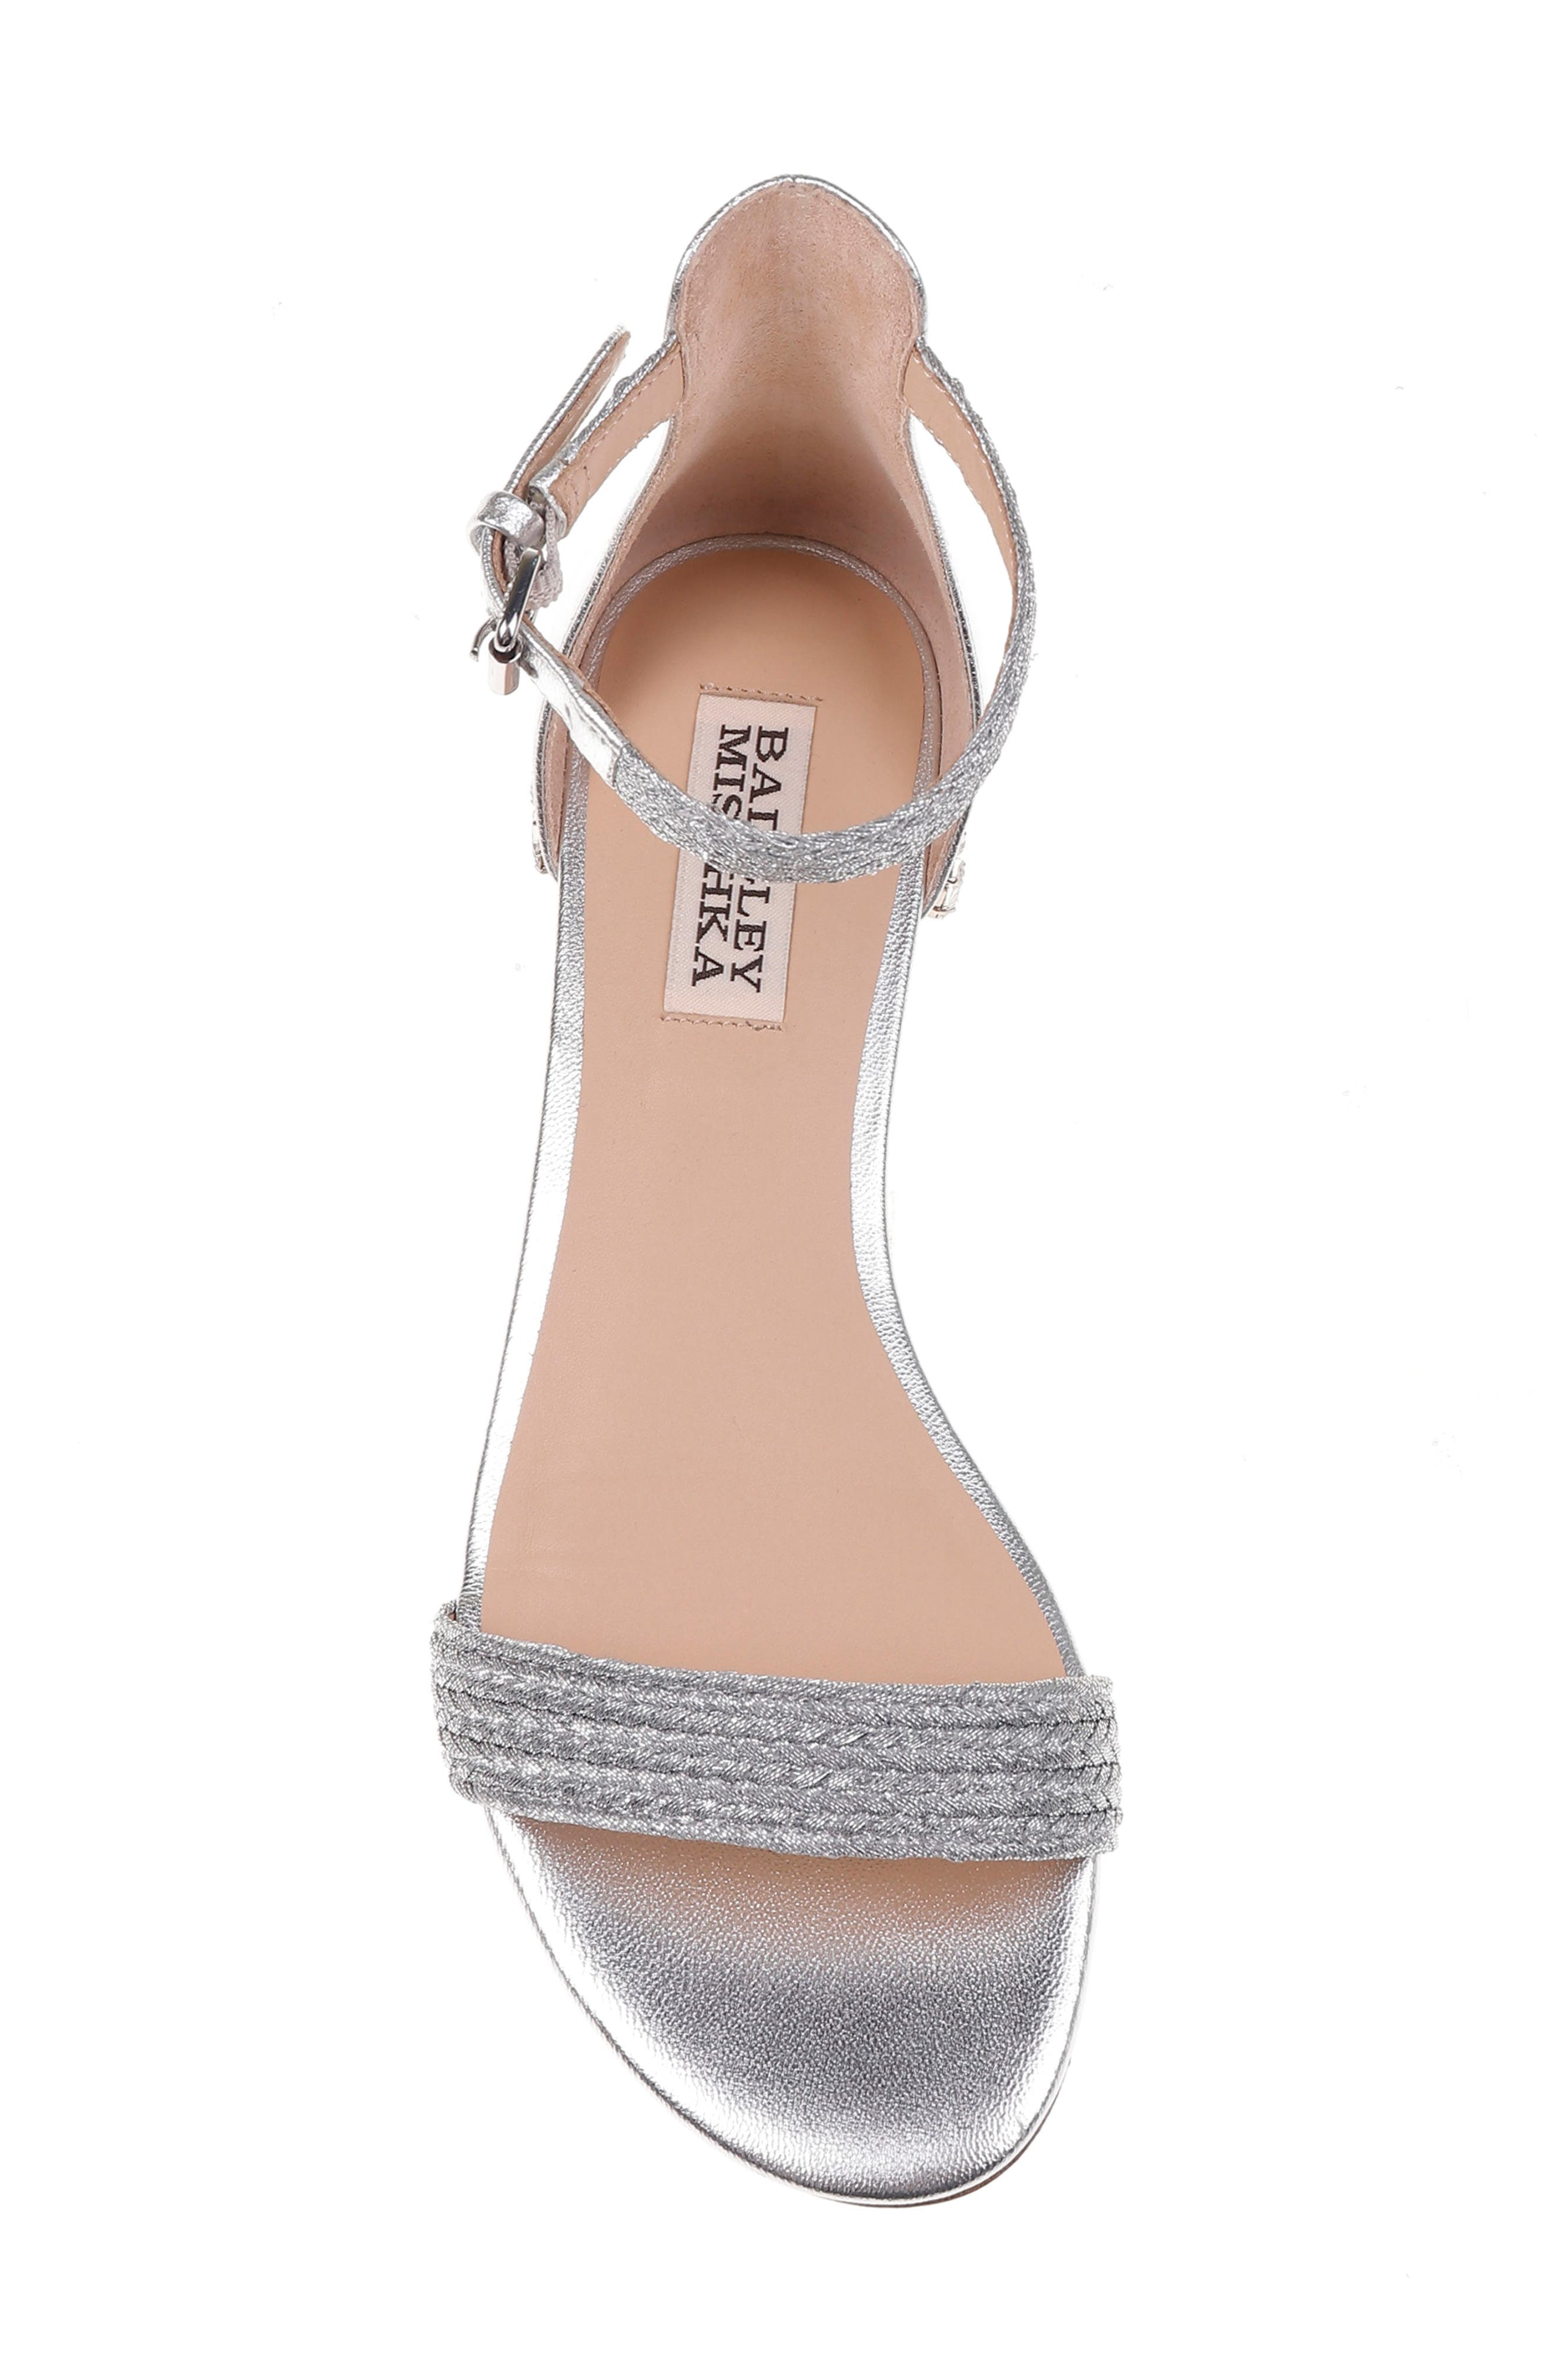 Steffie Ankle Strap Sandal,                             Alternate thumbnail 5, color,                             Silver Leather